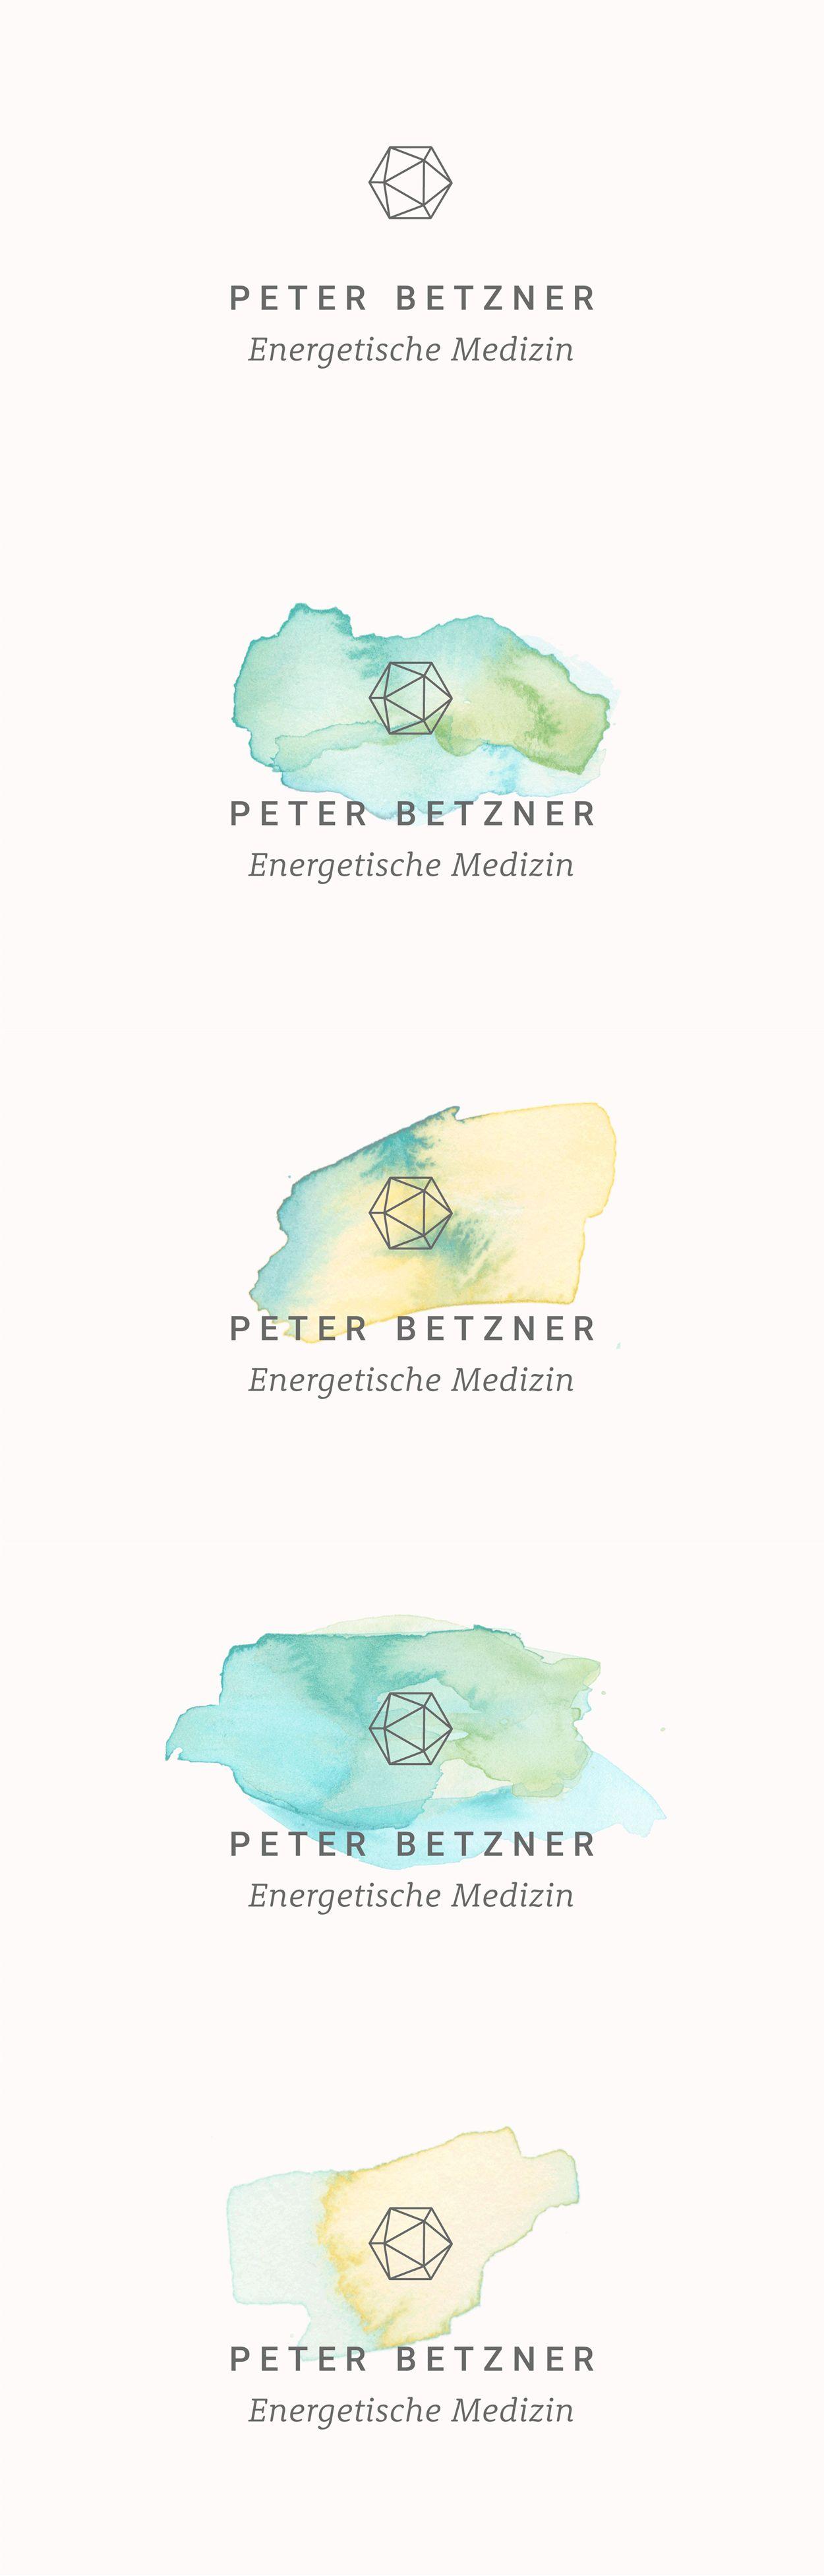 Individuelles Logodesign Für Den Heilpraktiker Peter Betzner